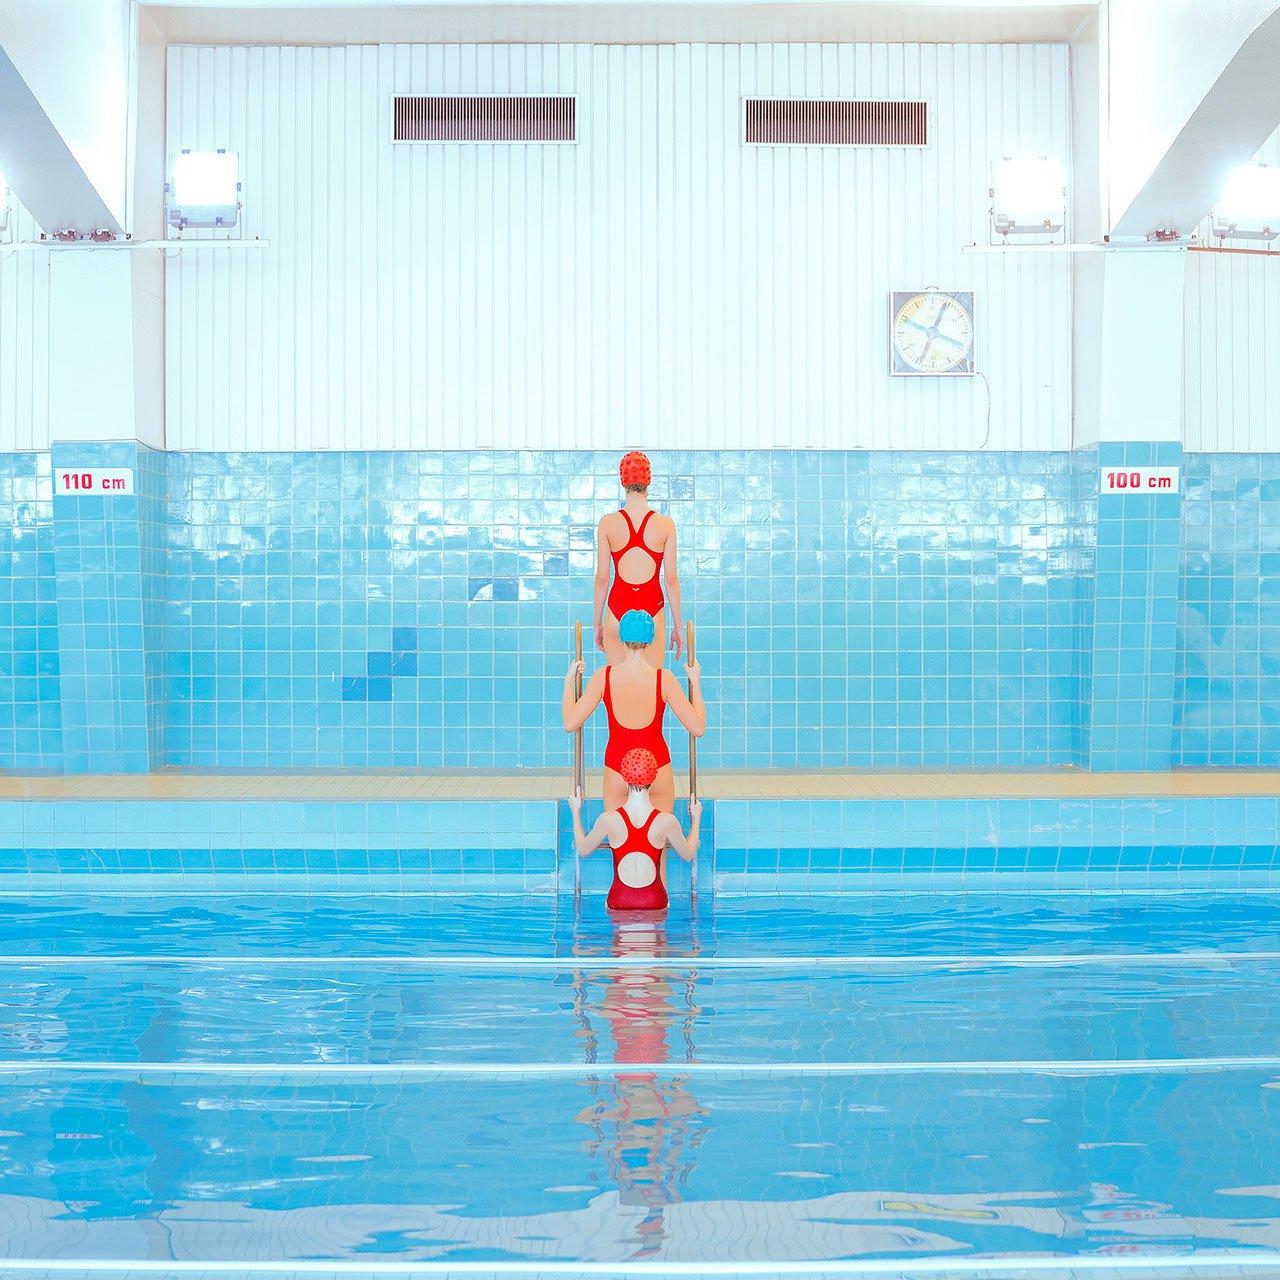 f4_maria_svarbova_swimming_trinity_yatzer (1).jpg